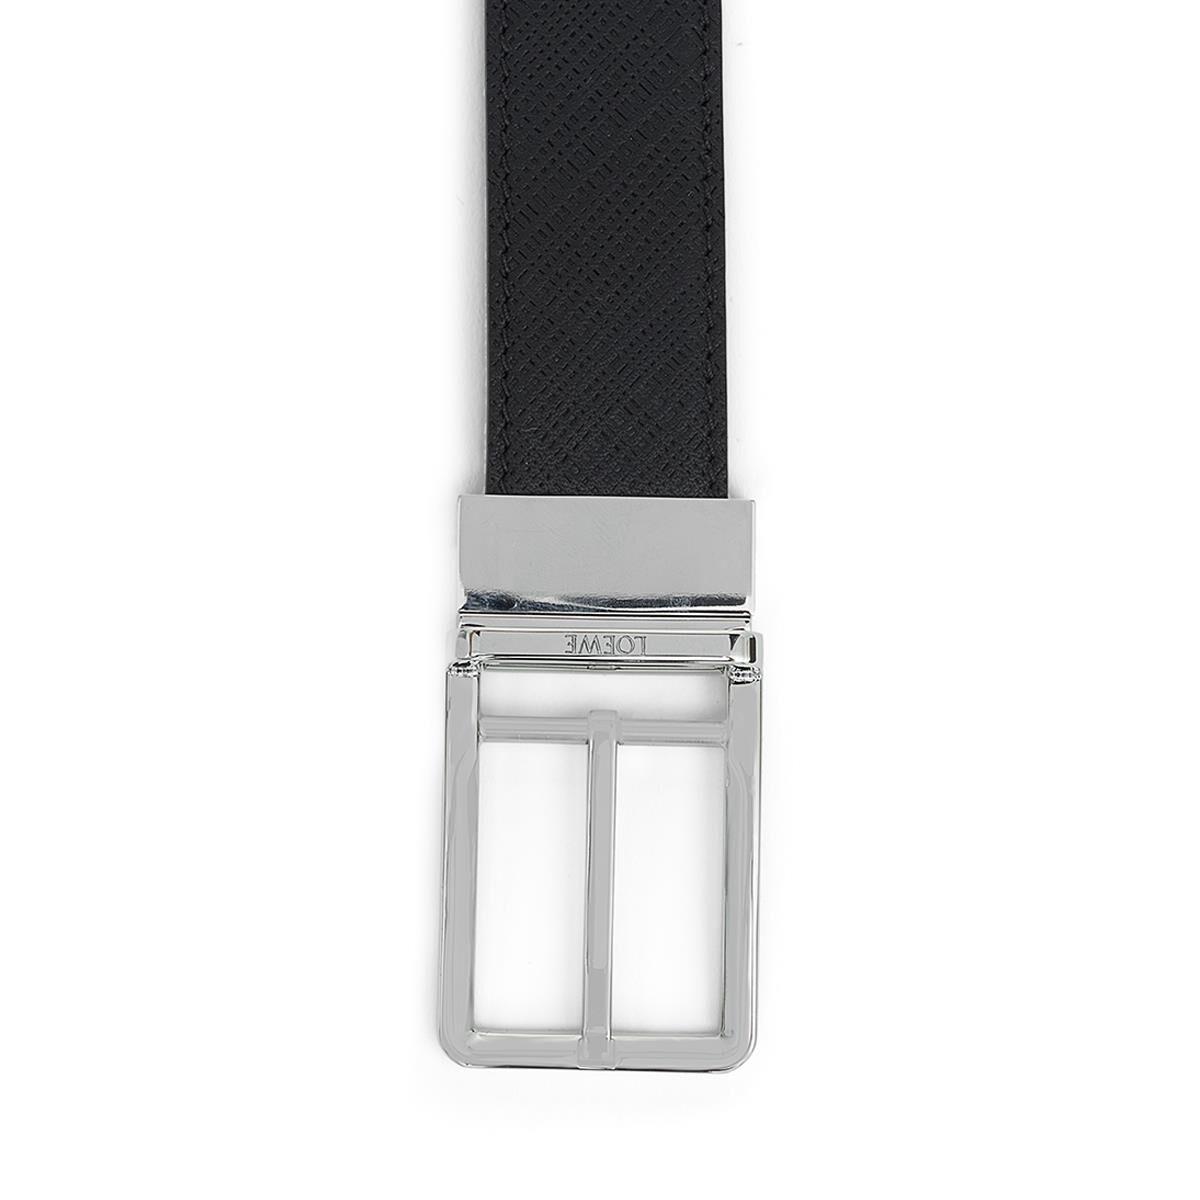 LOEWE Cinturon  Formal 3.2Cm Adj/Rev Negro/Paladio all